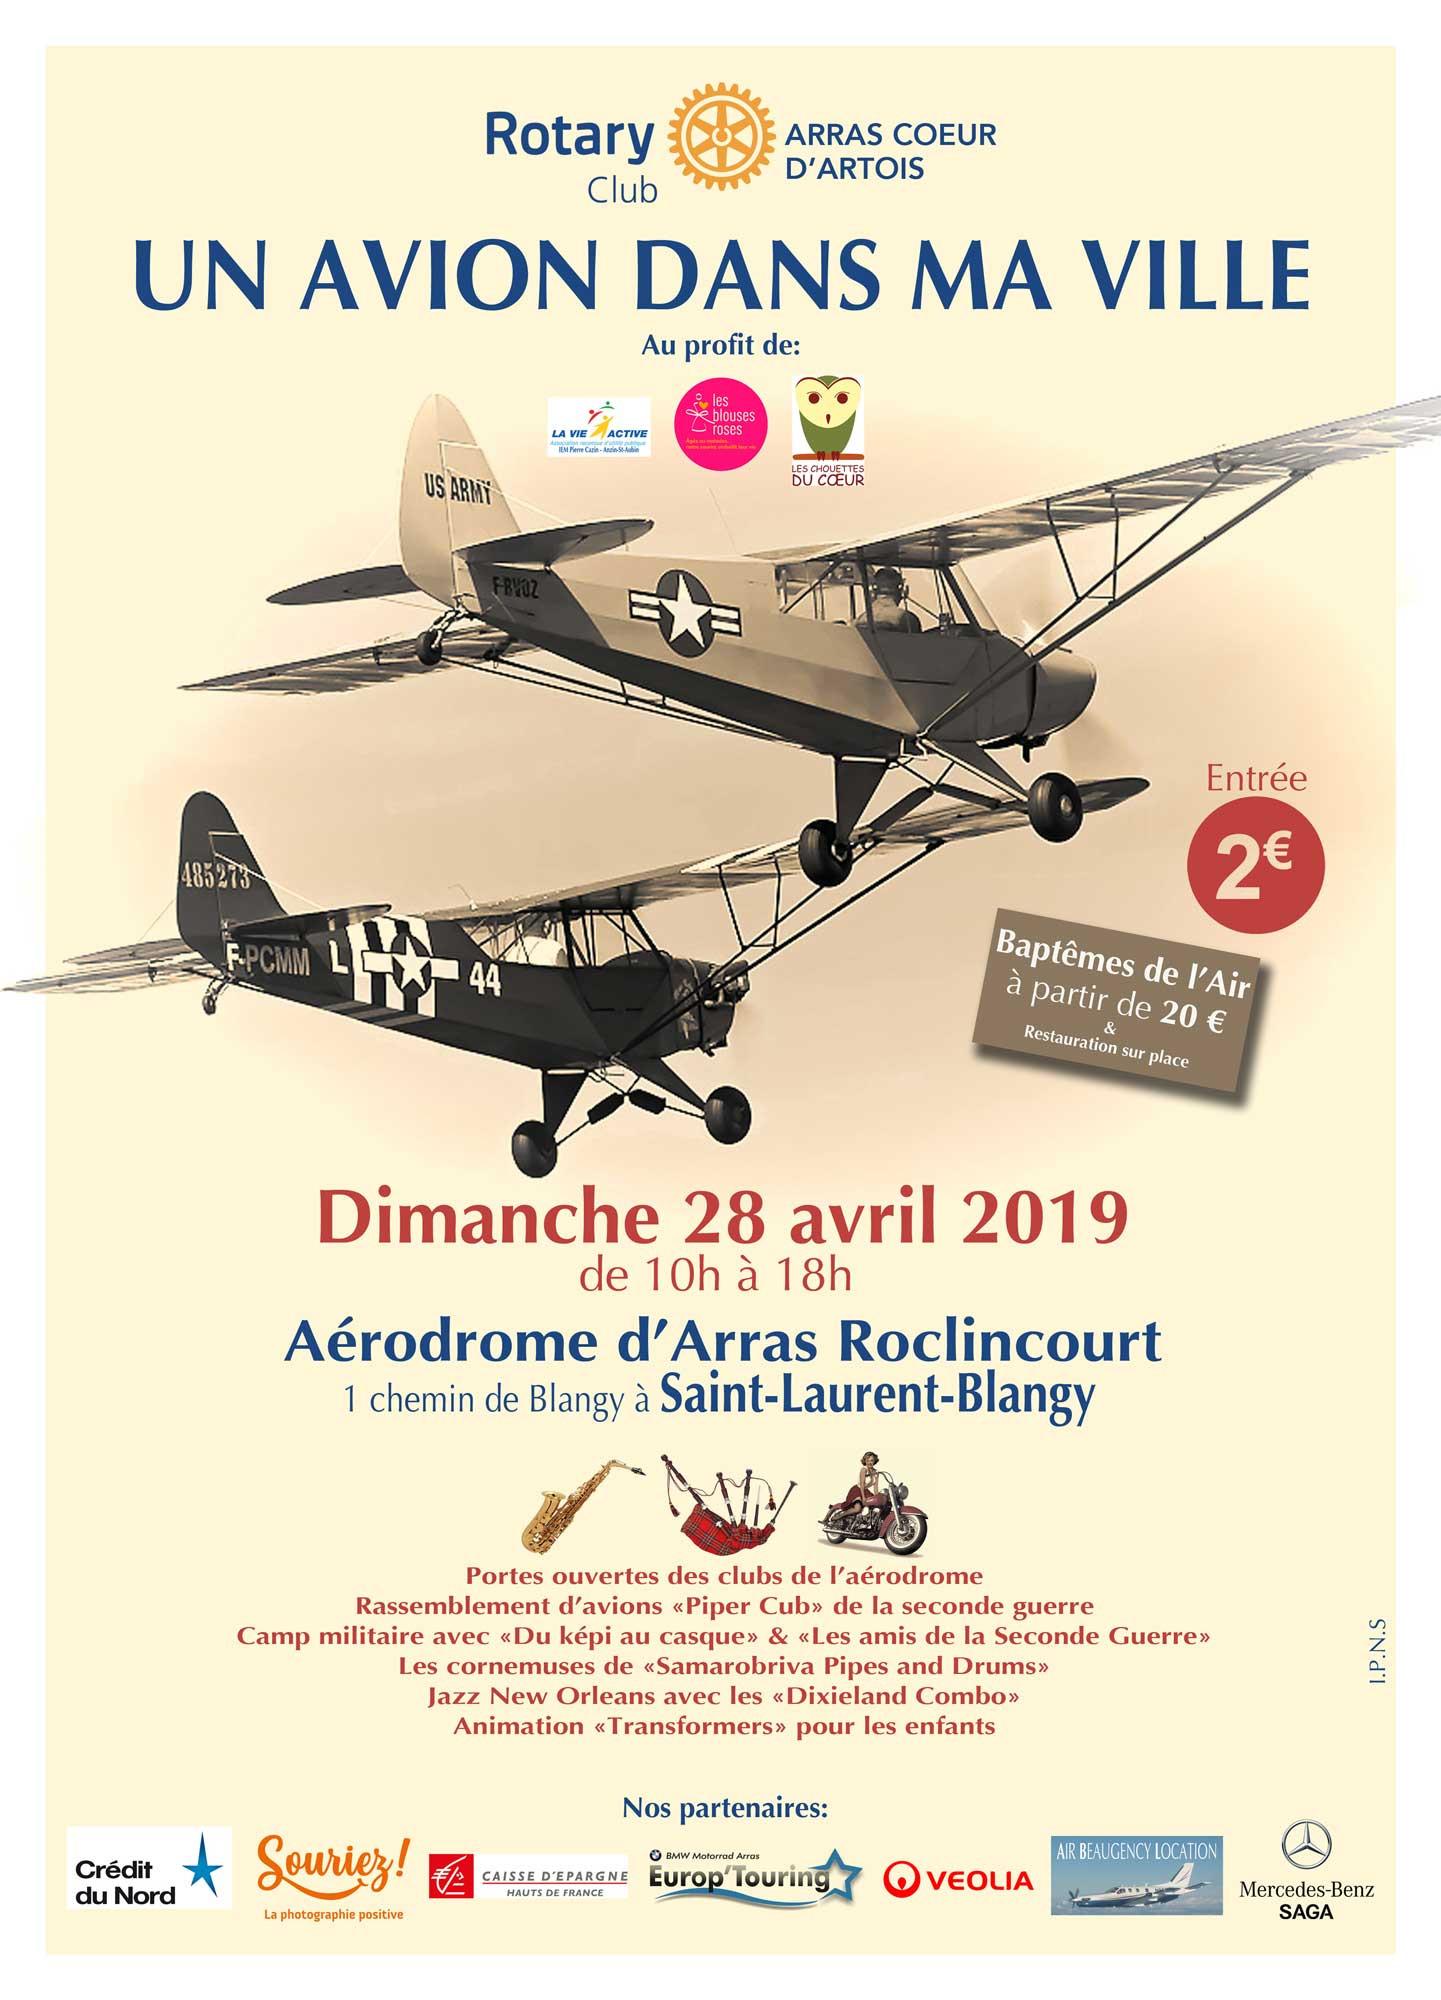 UADMV--Affiche-28-avril-2019-